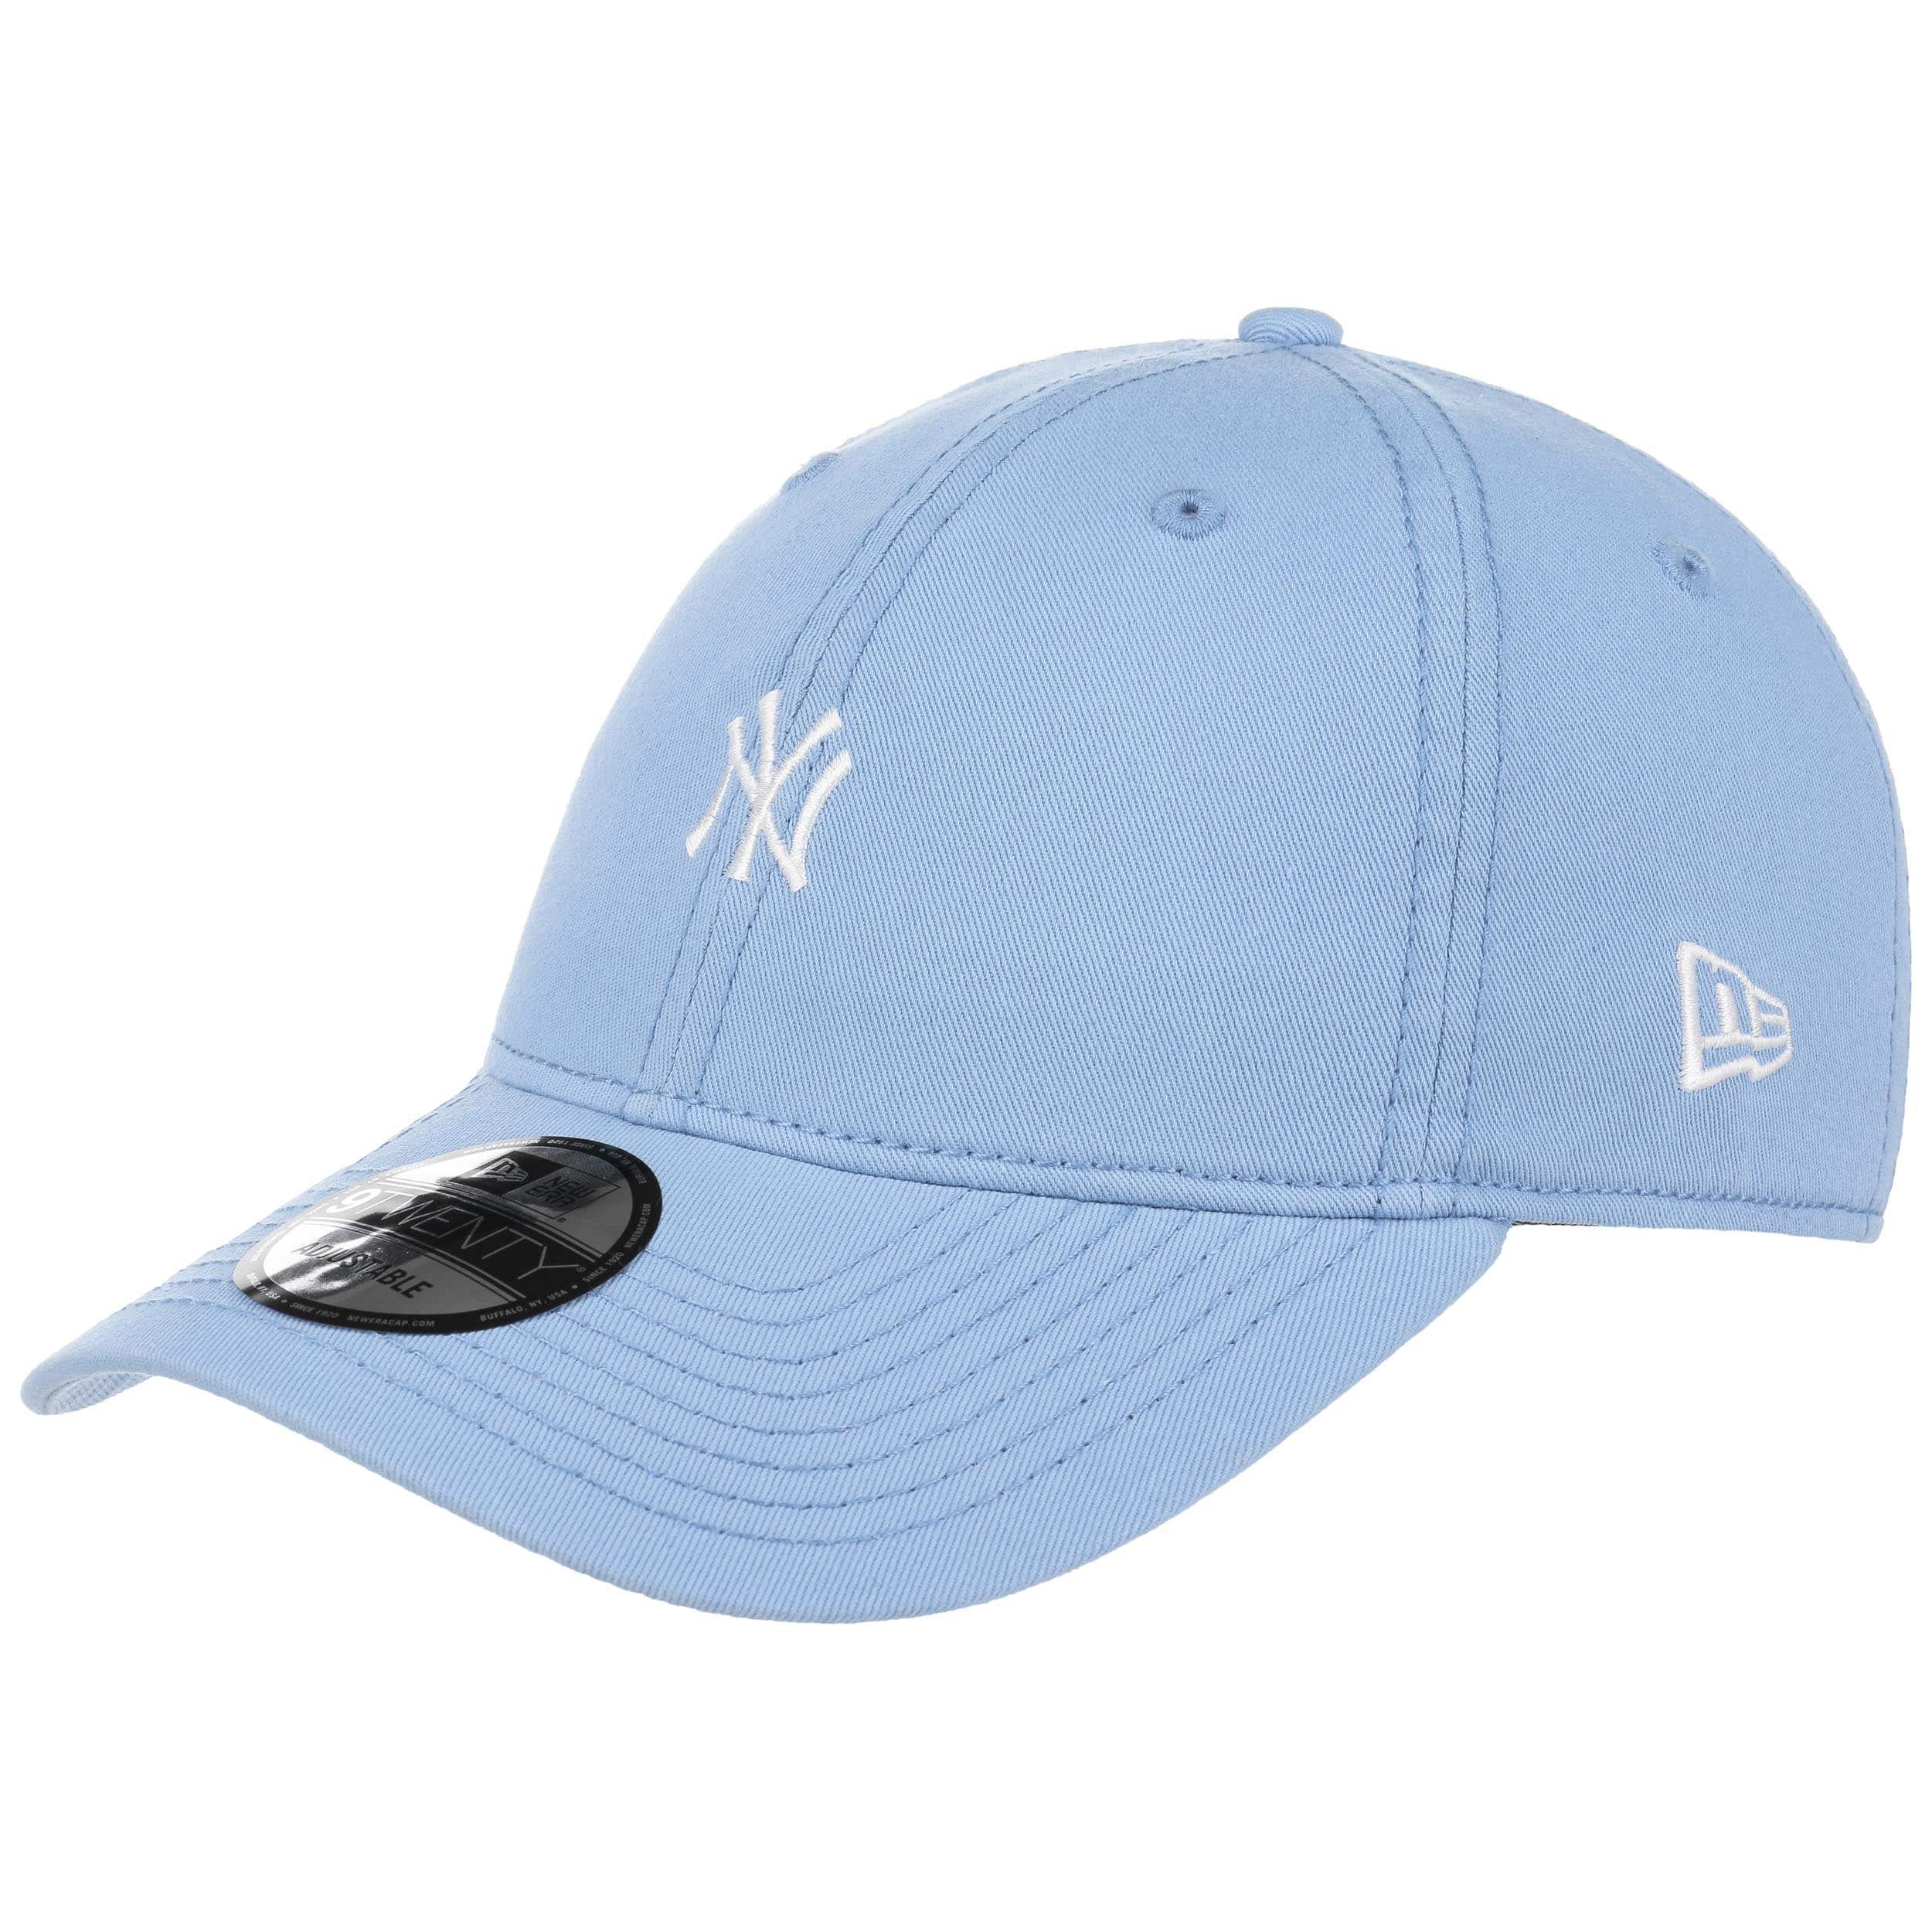 040faedff3e ... 9Twenty NY Yankees Pastel Cap by New Era - light blue 6